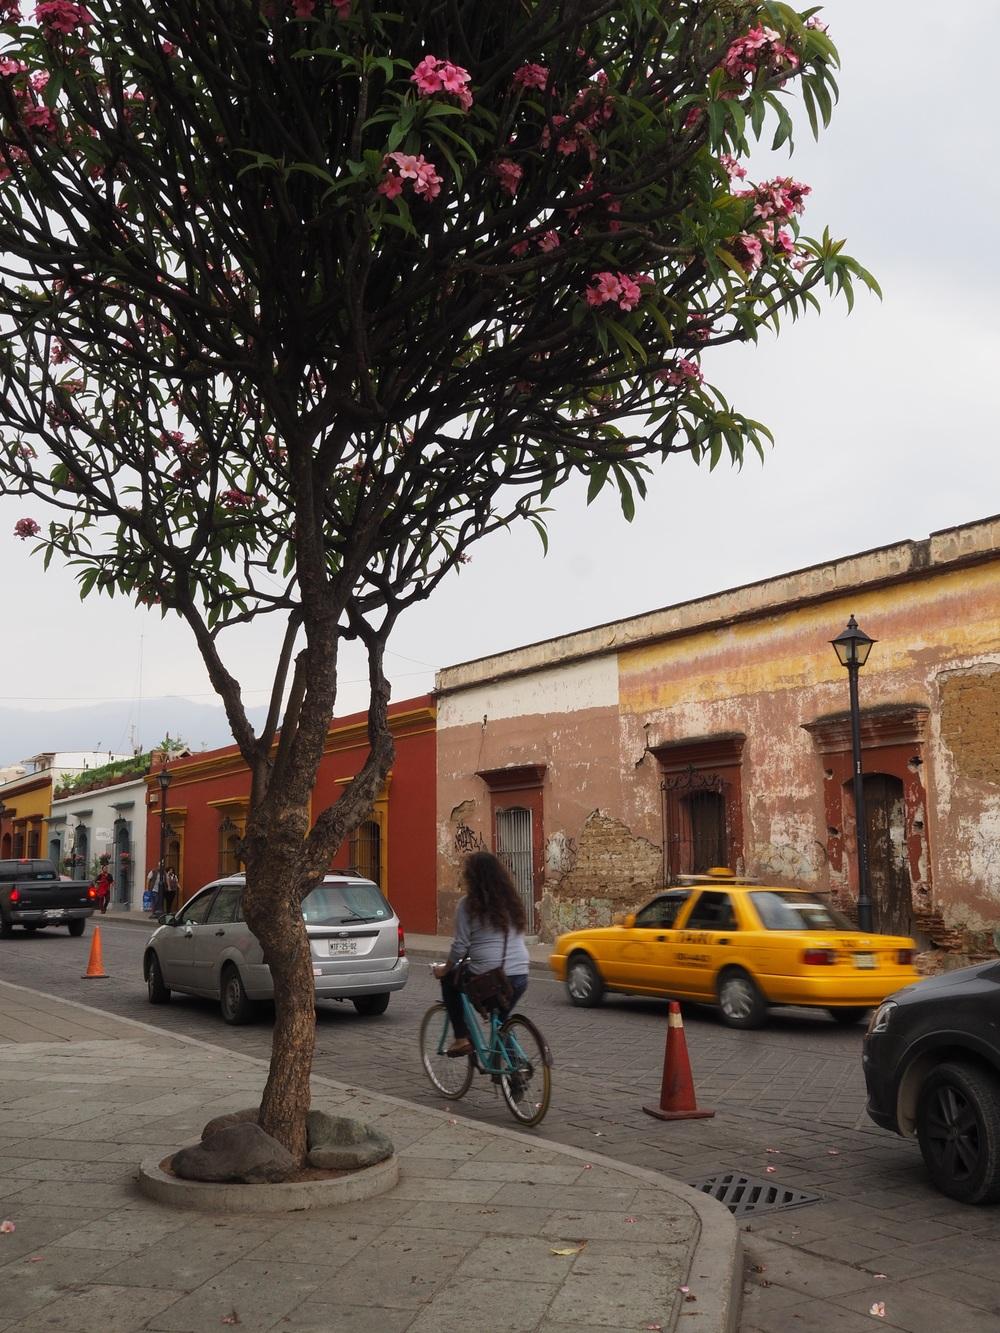 Colorful Oaxaca City